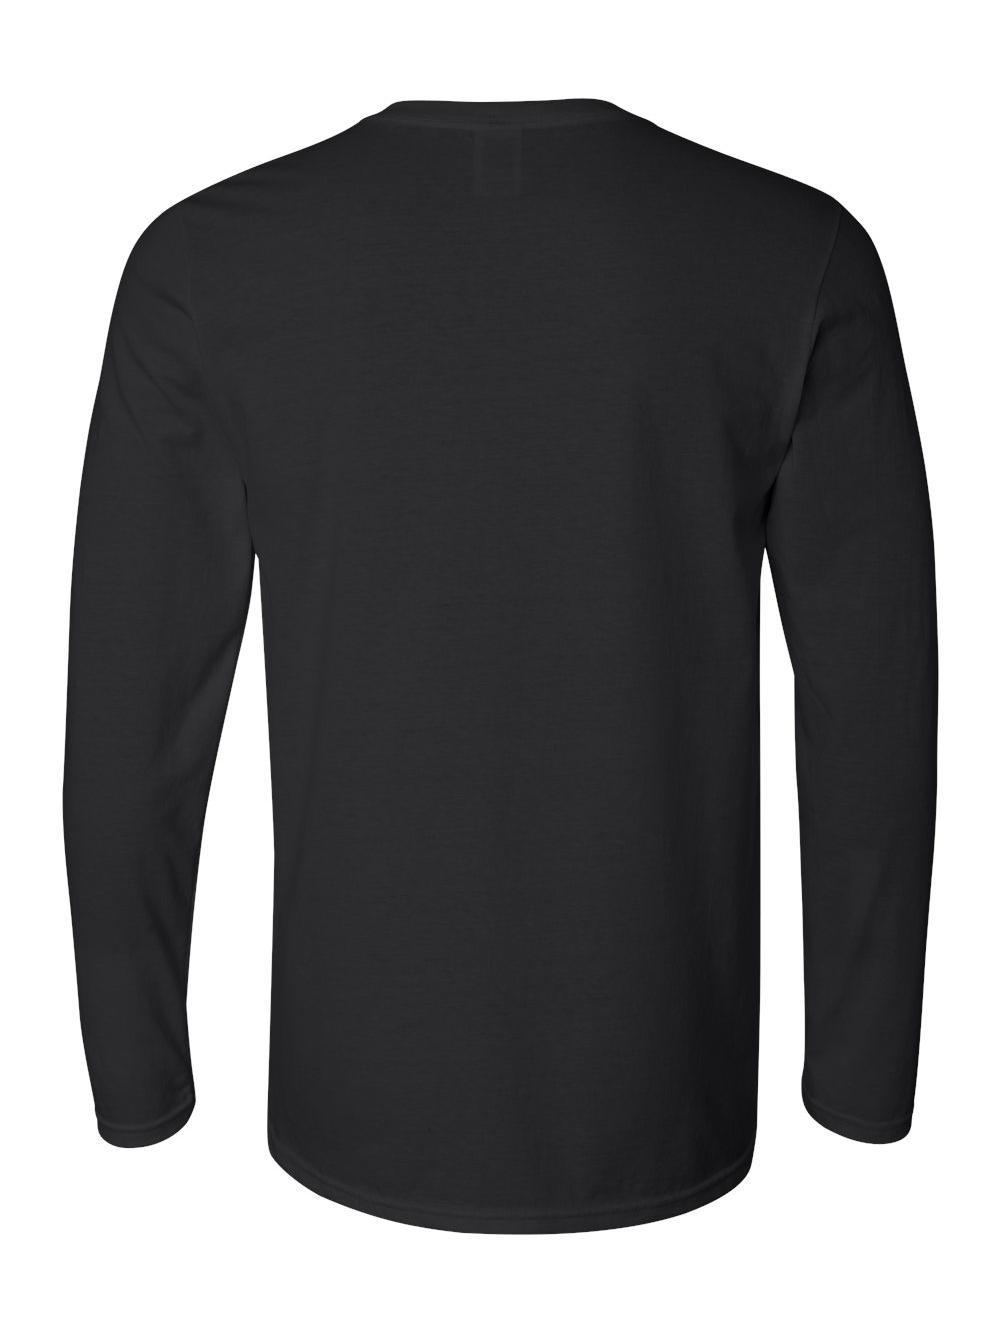 Gildan-Softstyle-Long-Sleeve-T-Shirt-64400 thumbnail 4